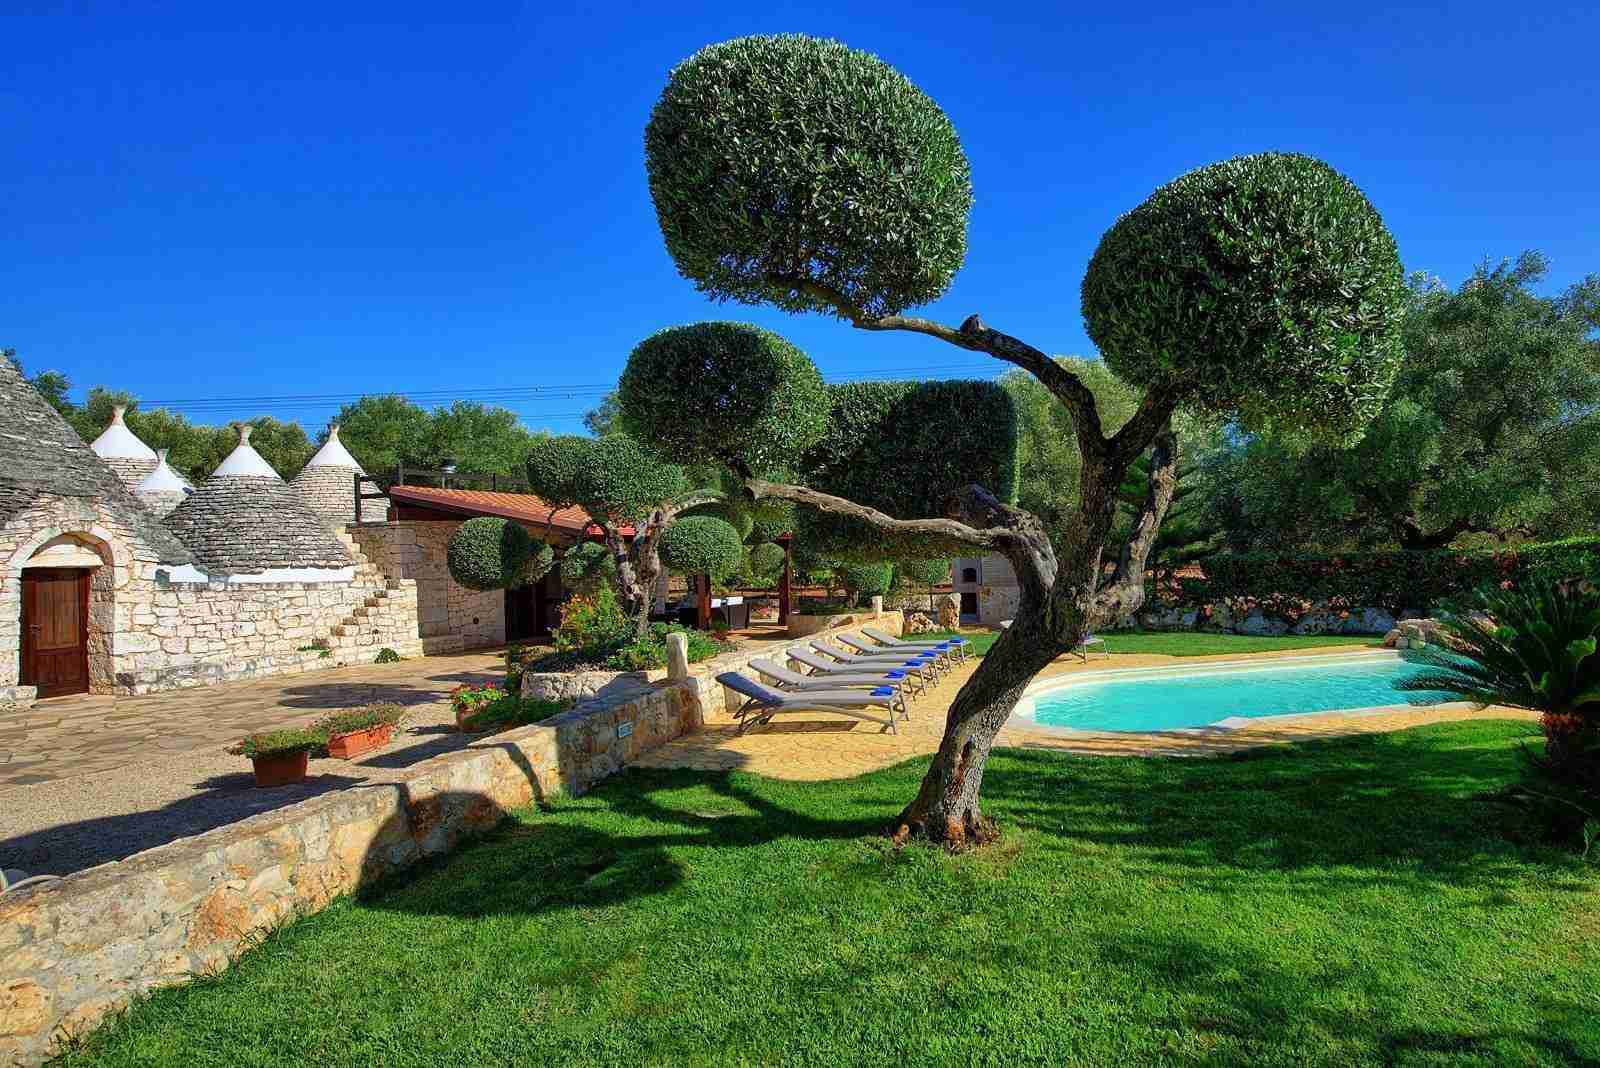 5 Sisin garden with pool